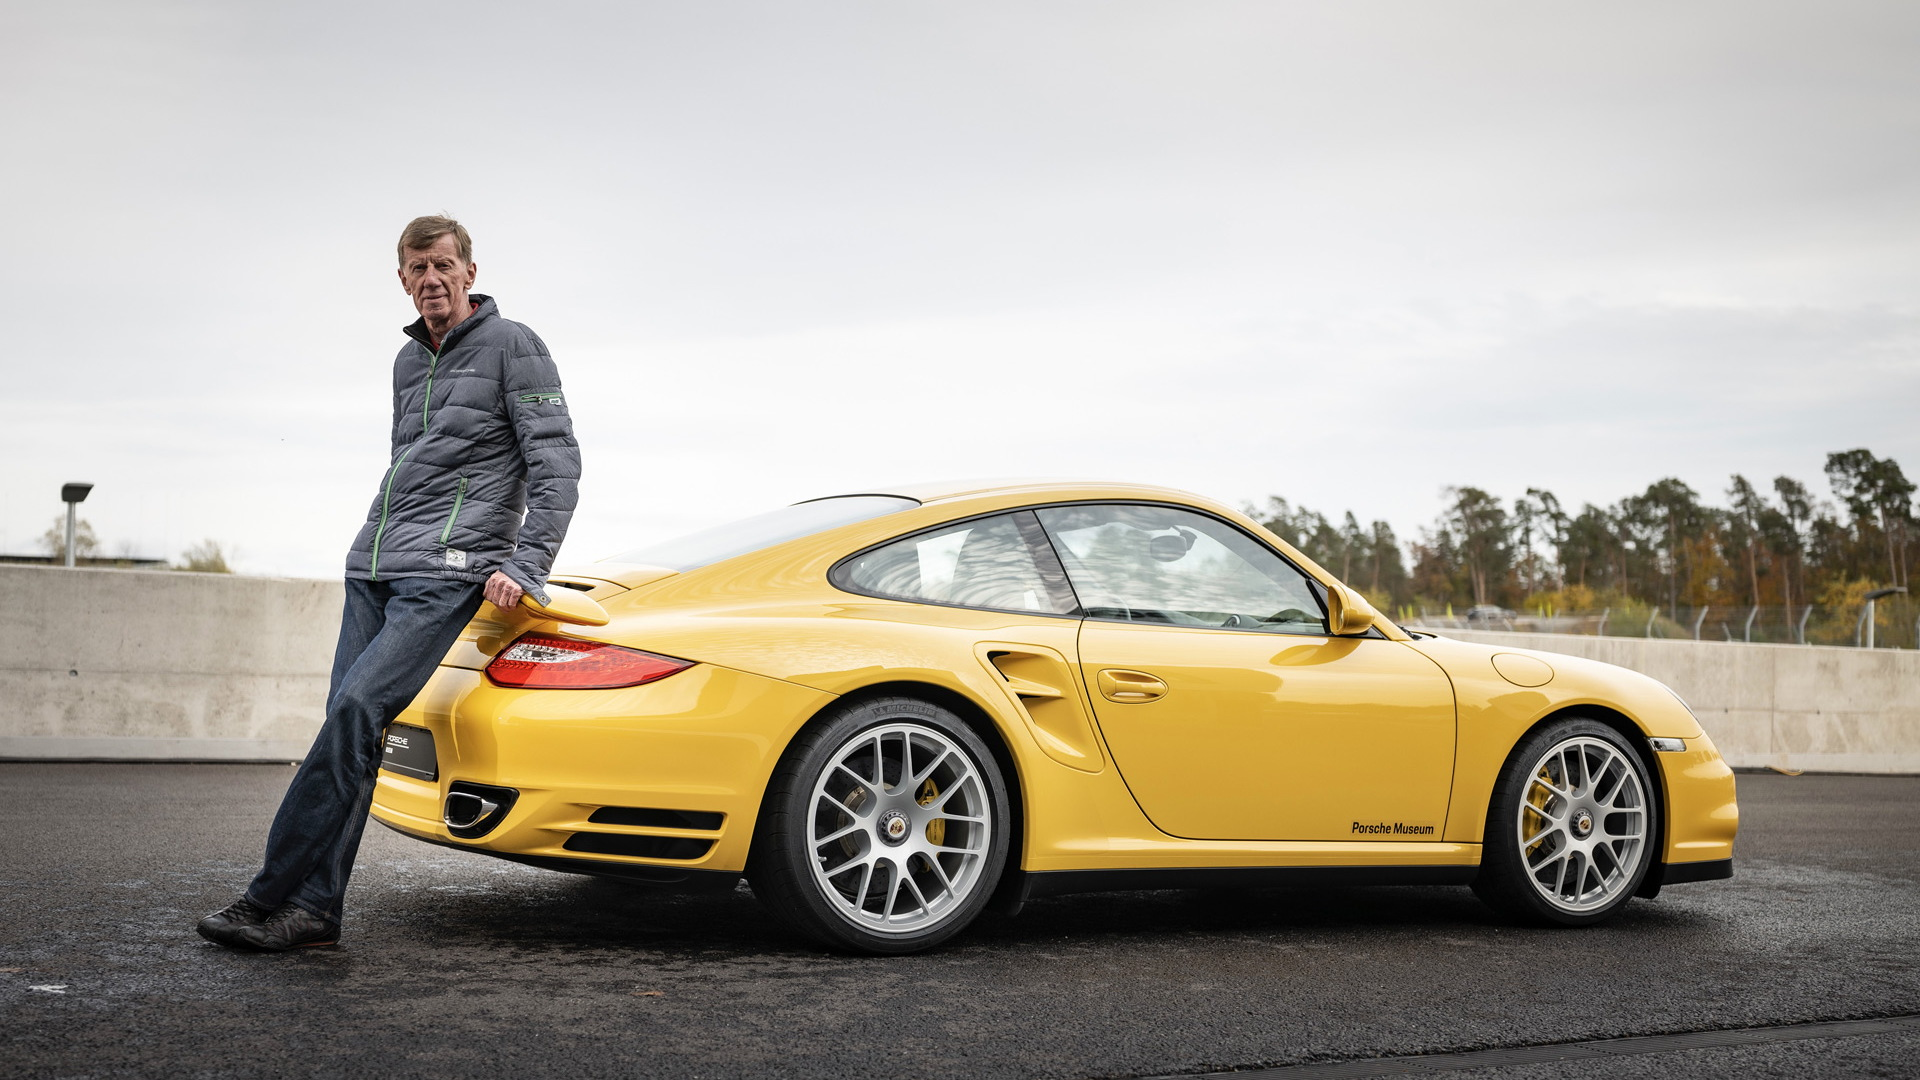 Walter Röhrl and the 997-generation Porsche 911 Turbo